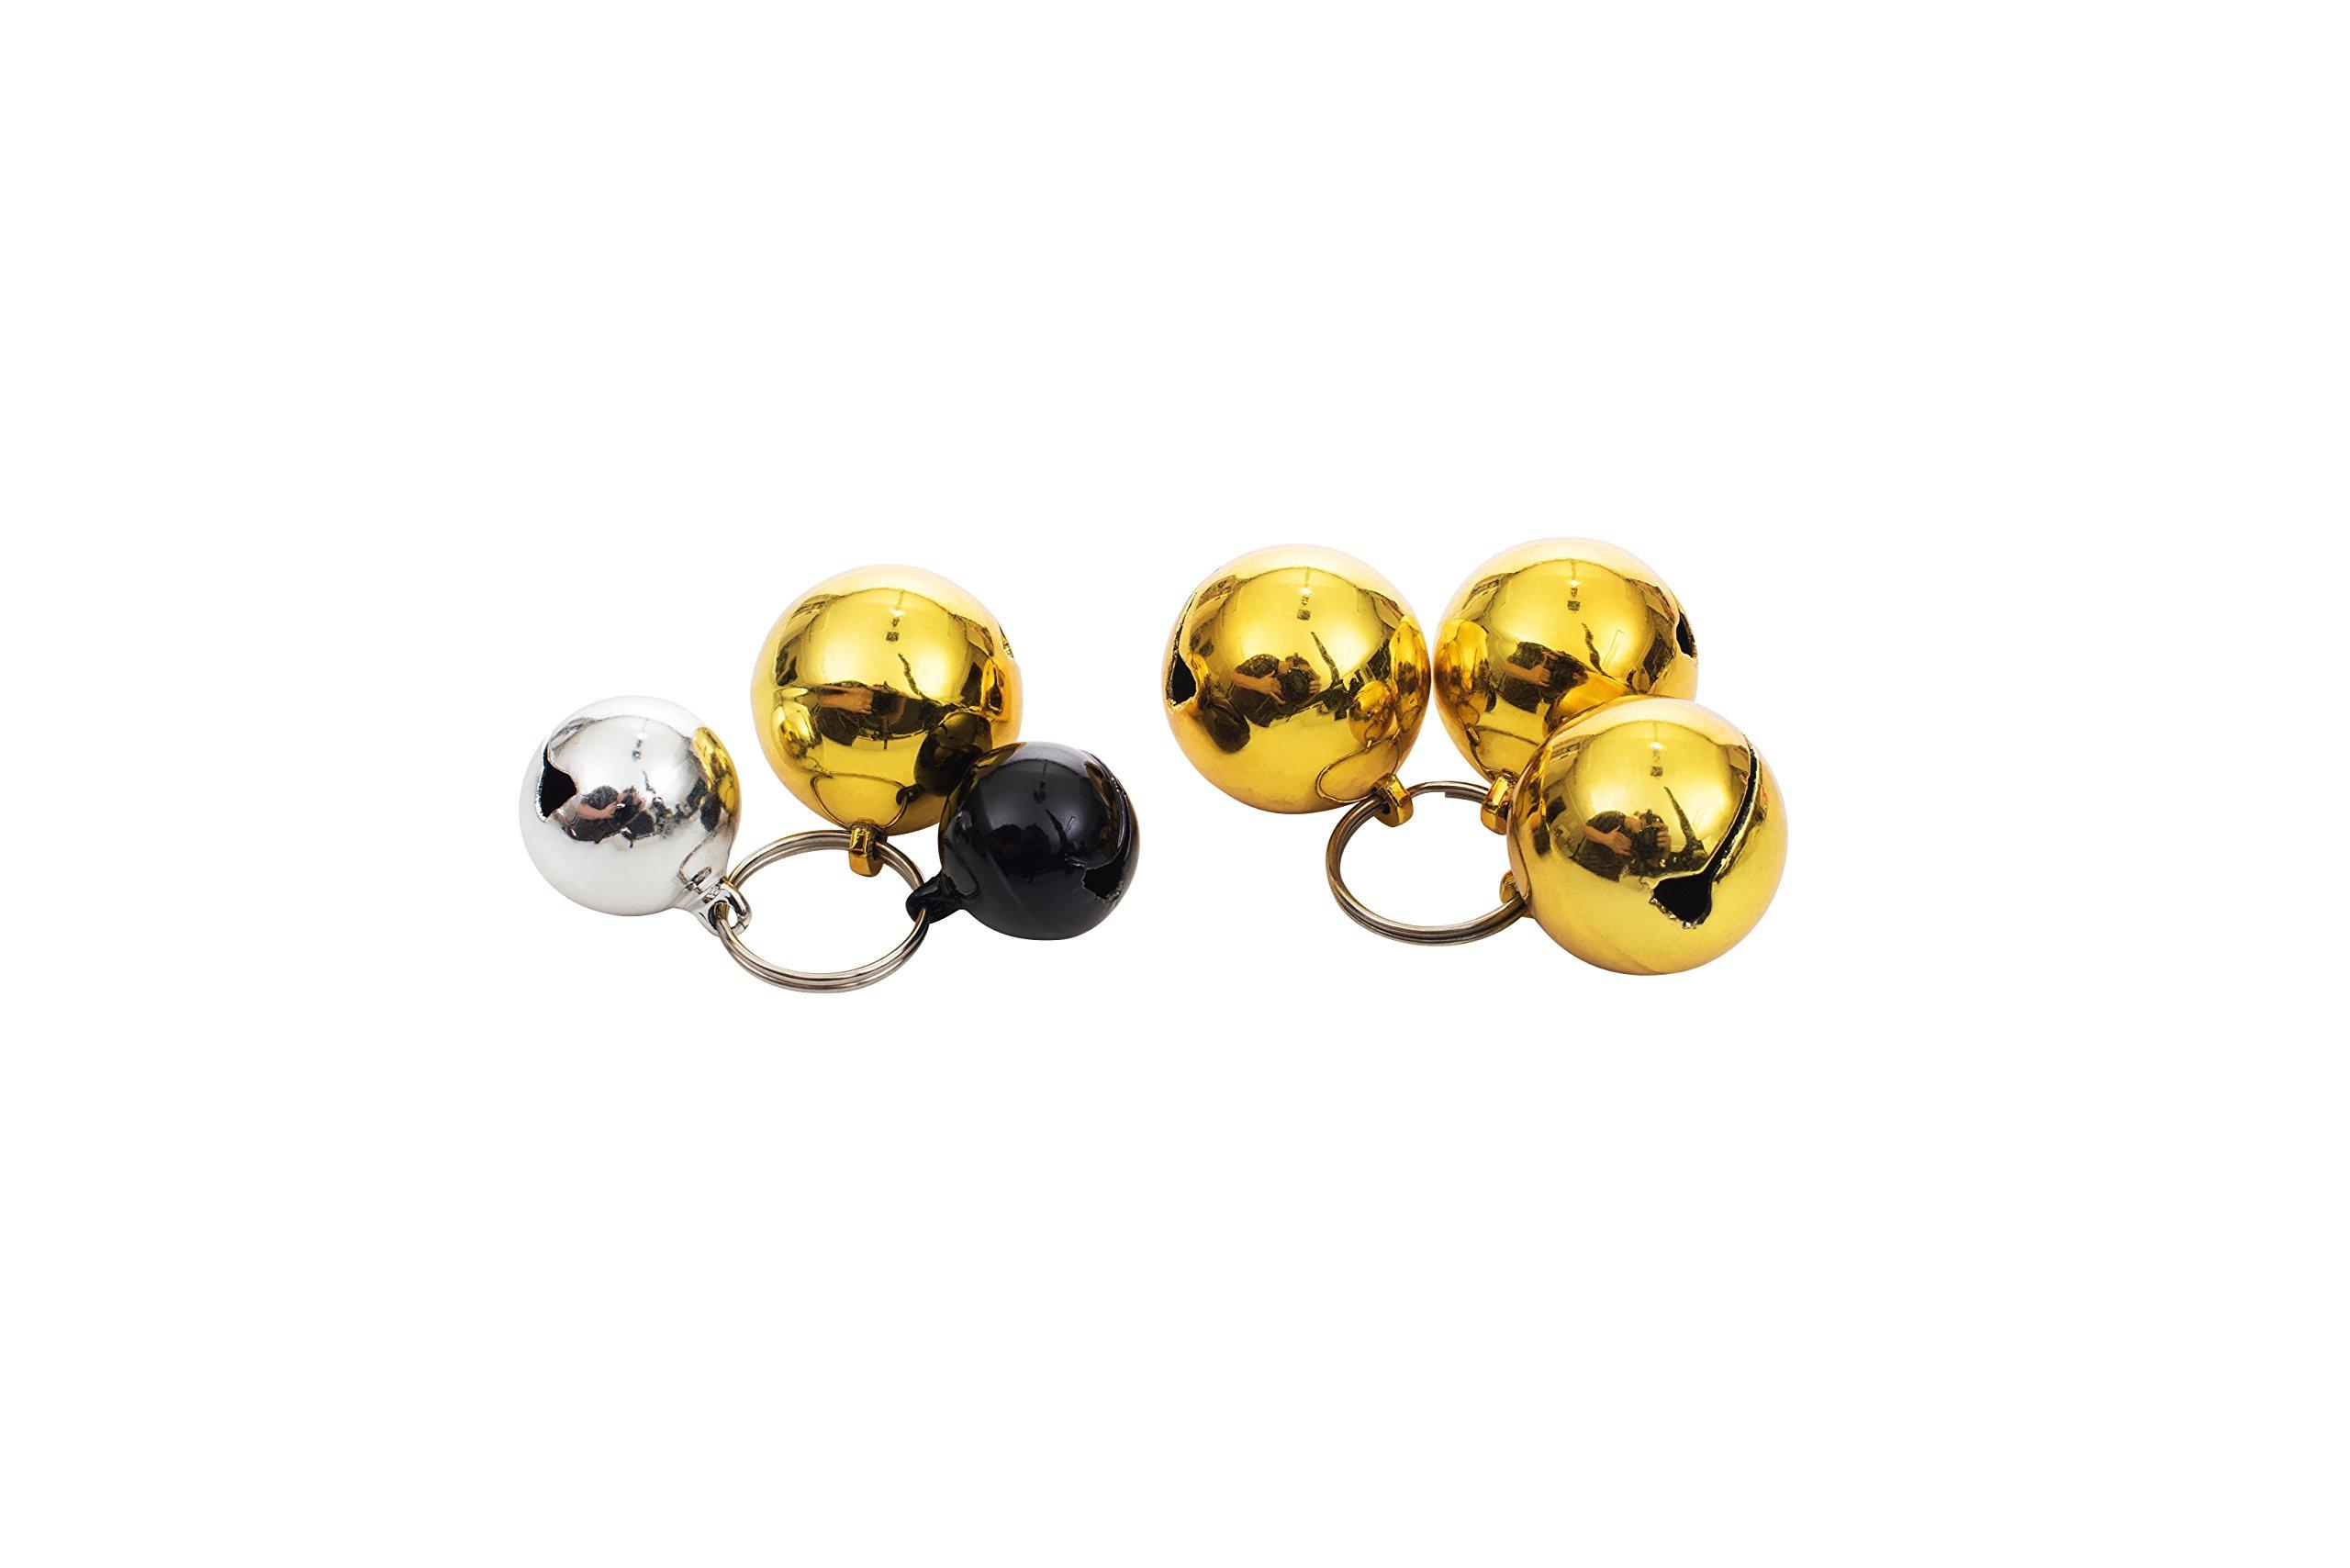 Dog Bells (12 Pack) Strongest & Loudest Dog Collar Bells by Muzitao